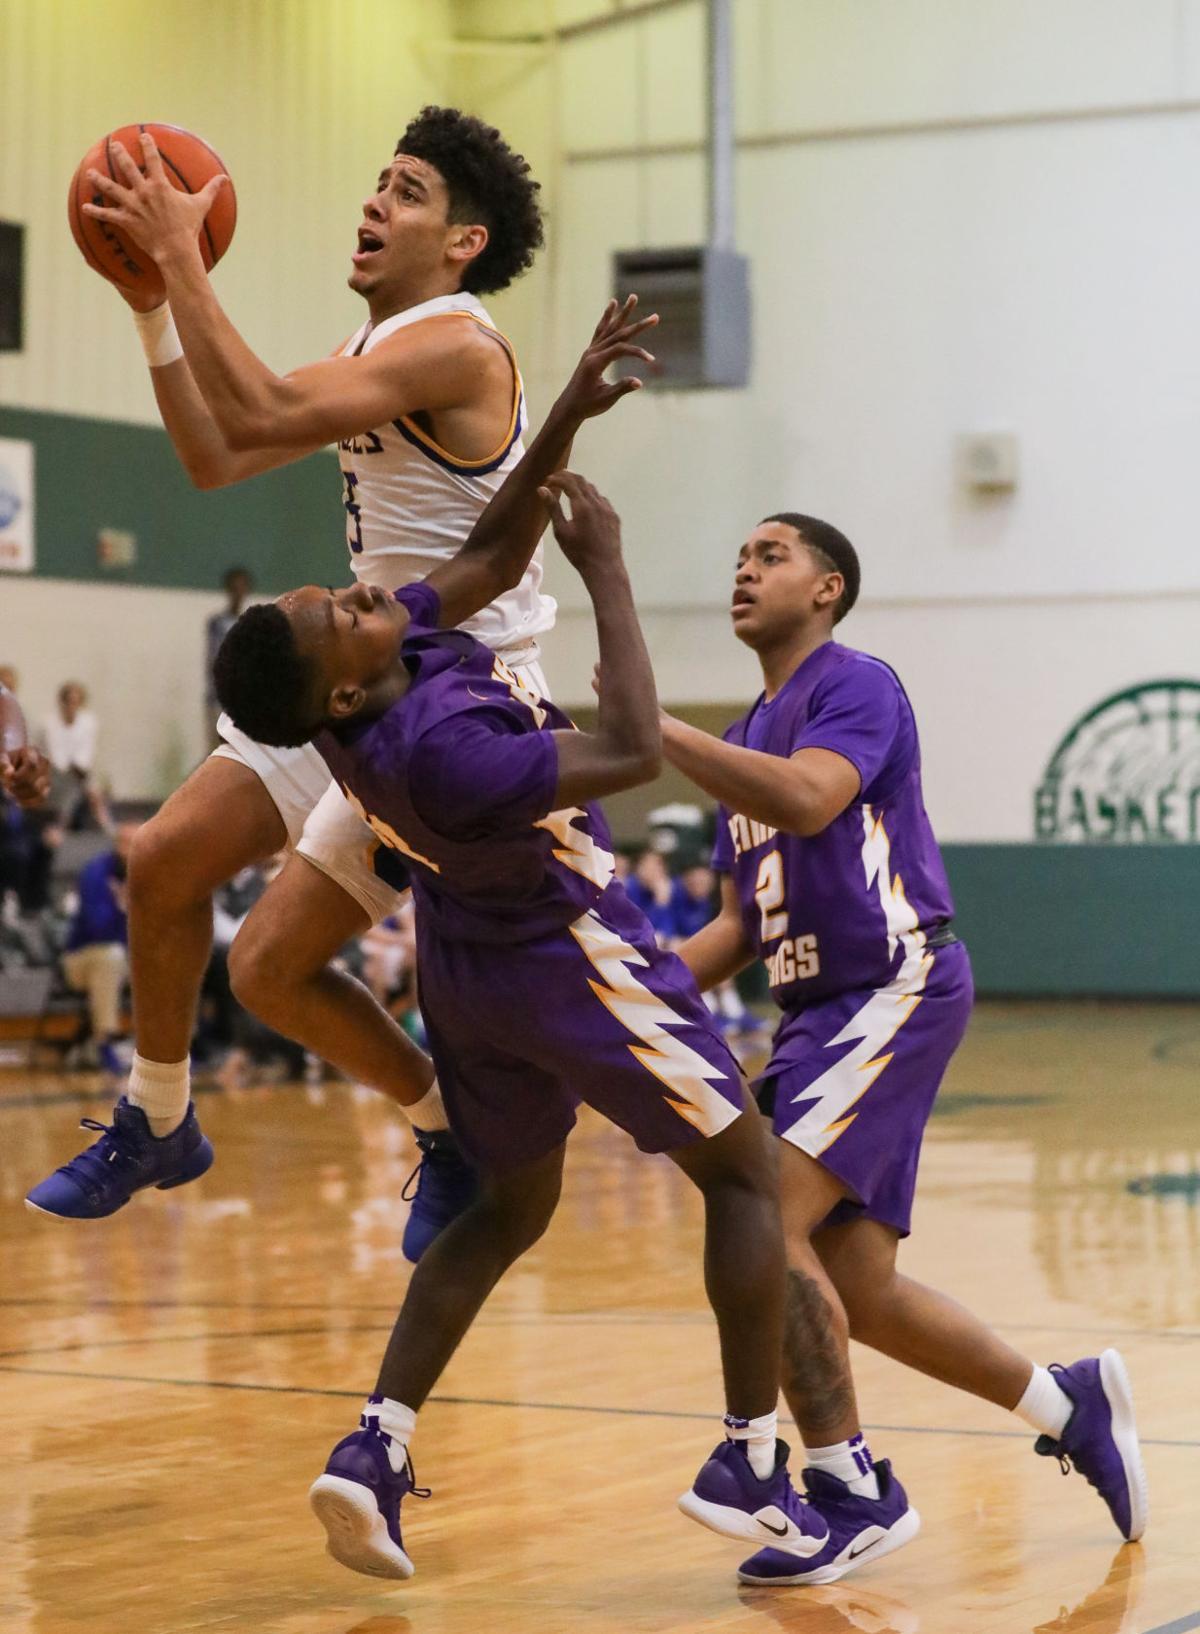 Live Oak vs Denham Springs boys basketball DaDa Capling T.J. Magee